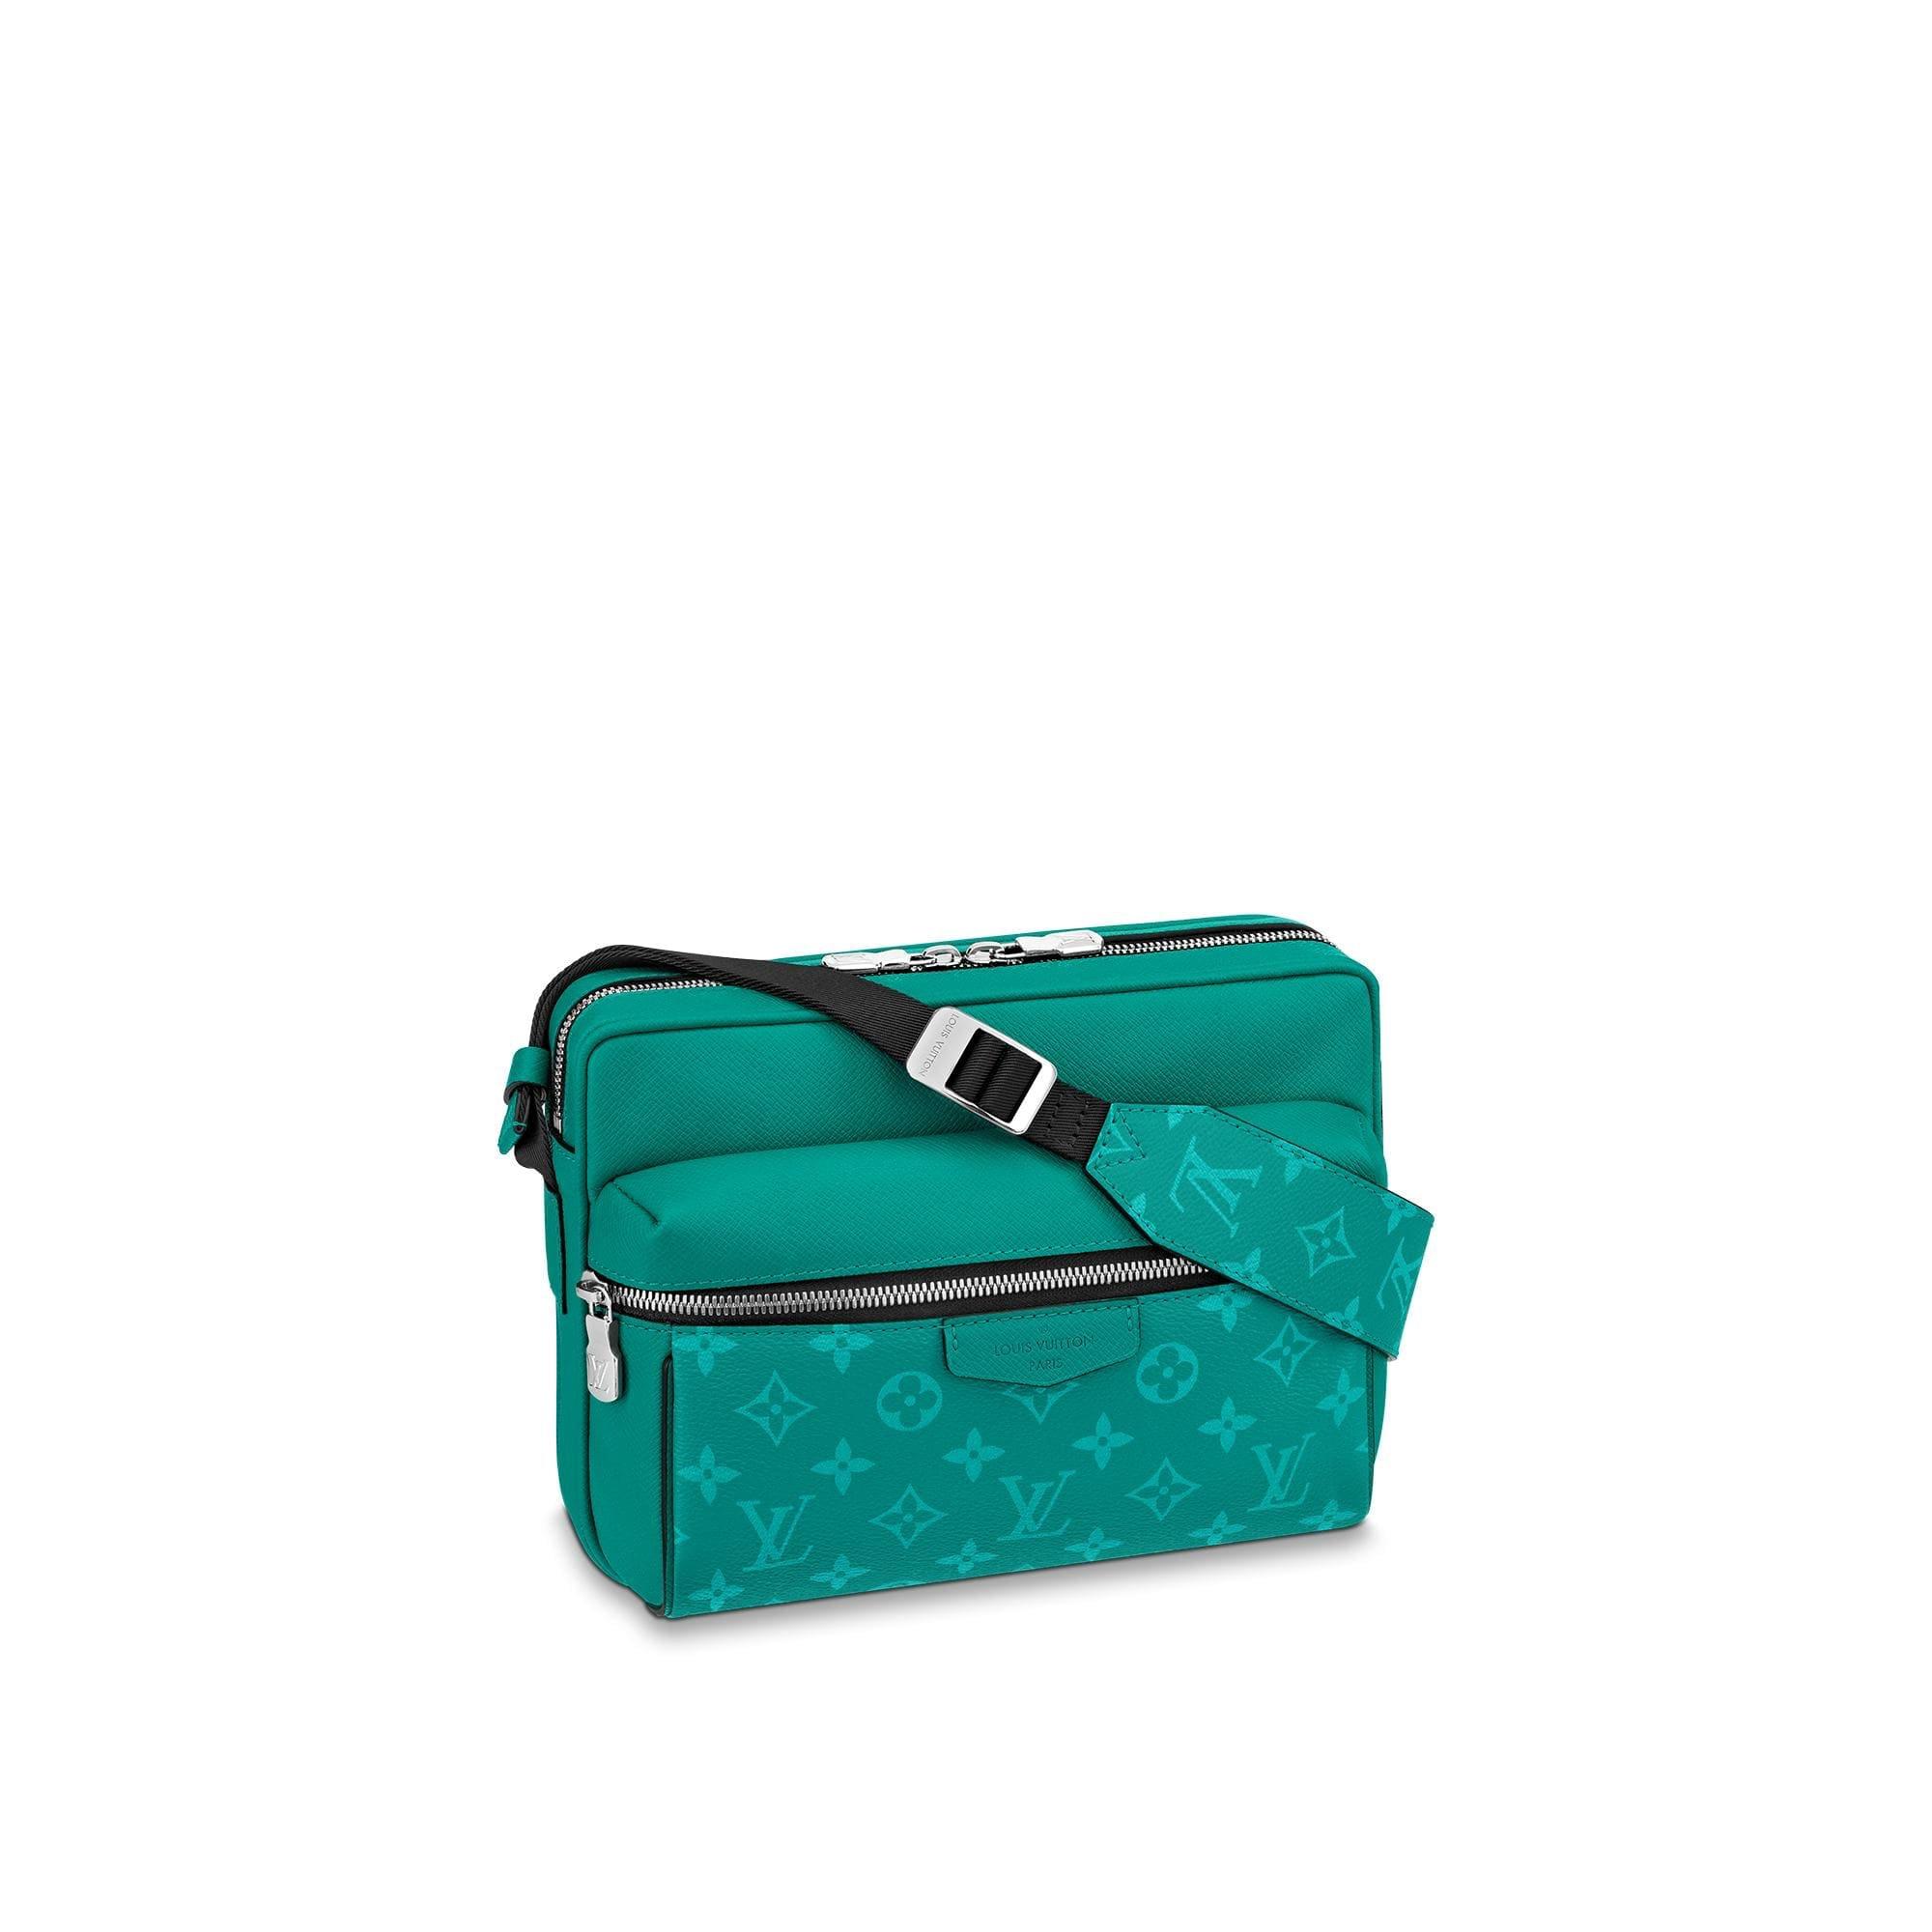 Louis Vuitton Outdoor Messenger Monogram Amazon Taiga Pine Green